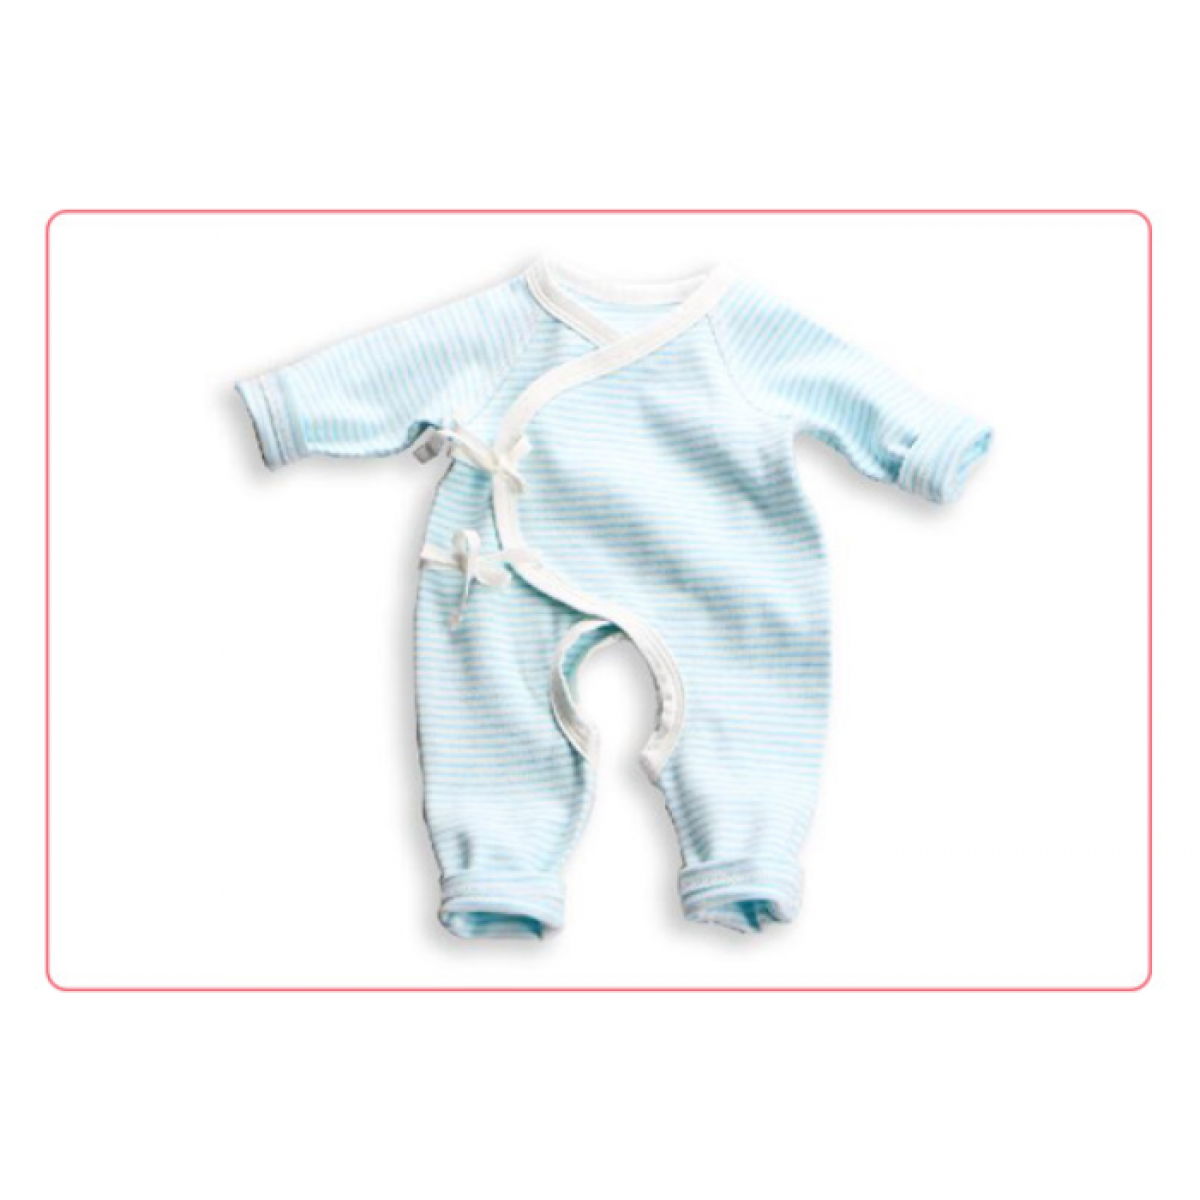 Premature Baby Clothes for 1-2kg / 2-4kg